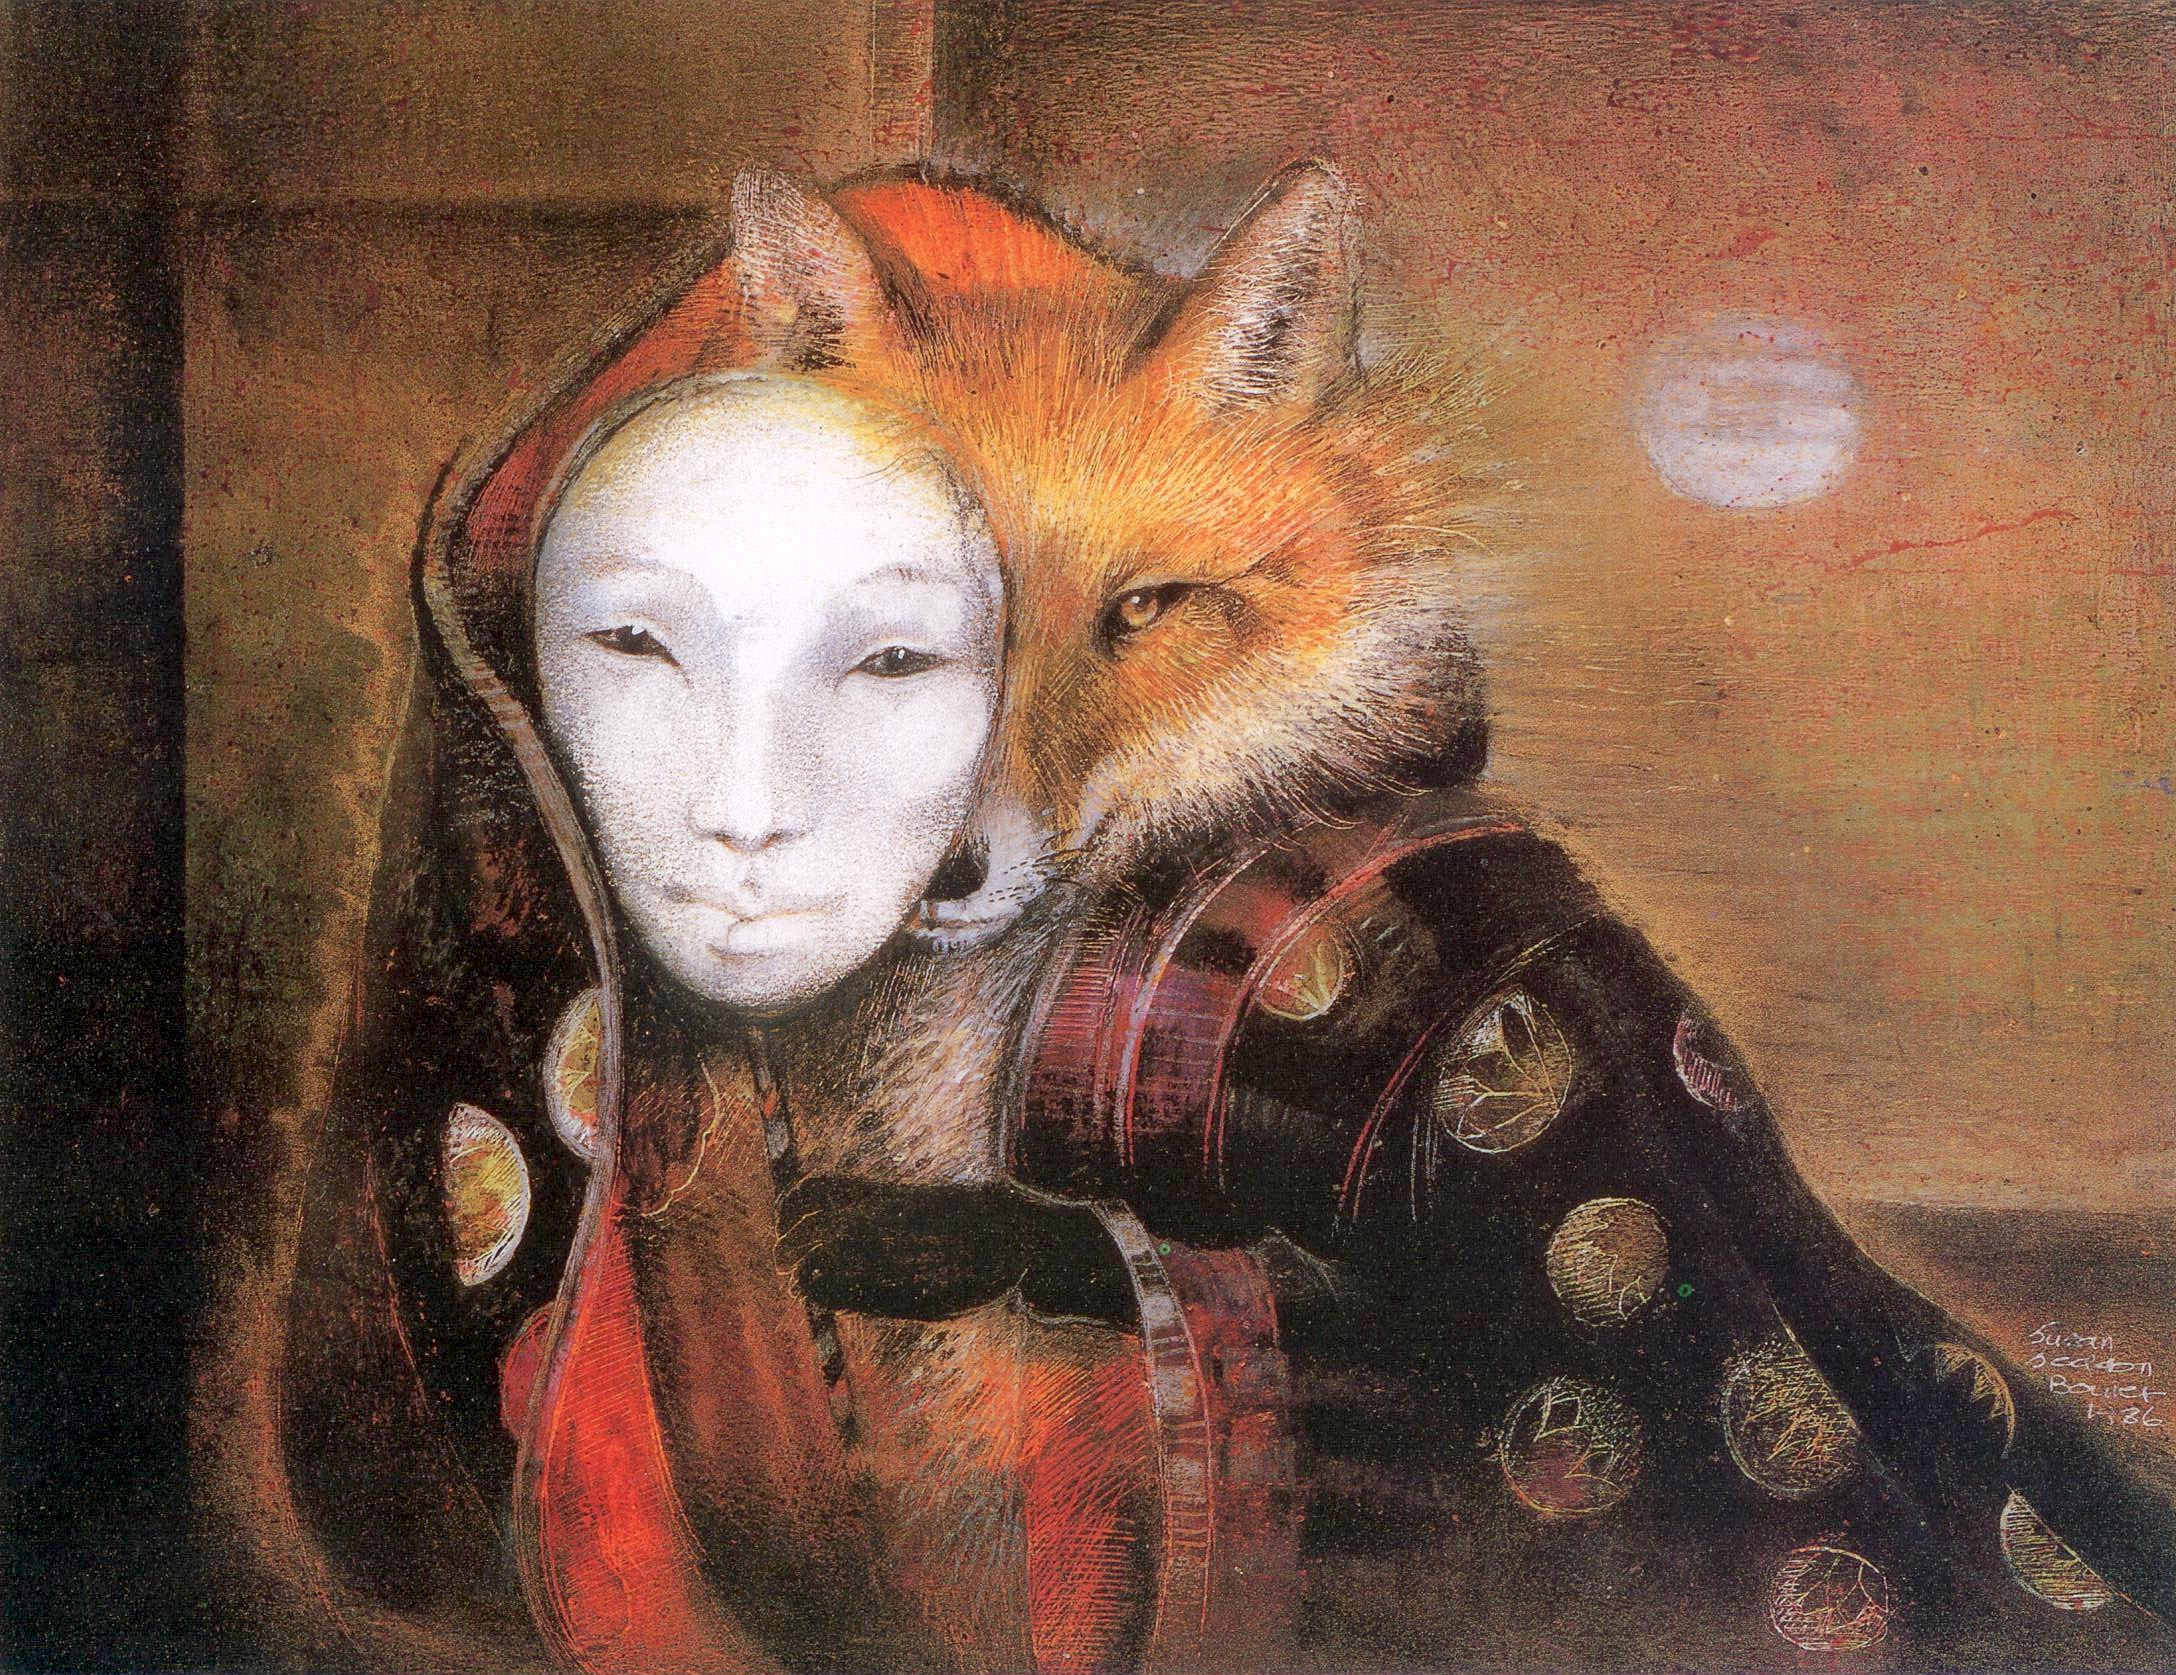 Fox Maiden, by Susan Seddon Boulet